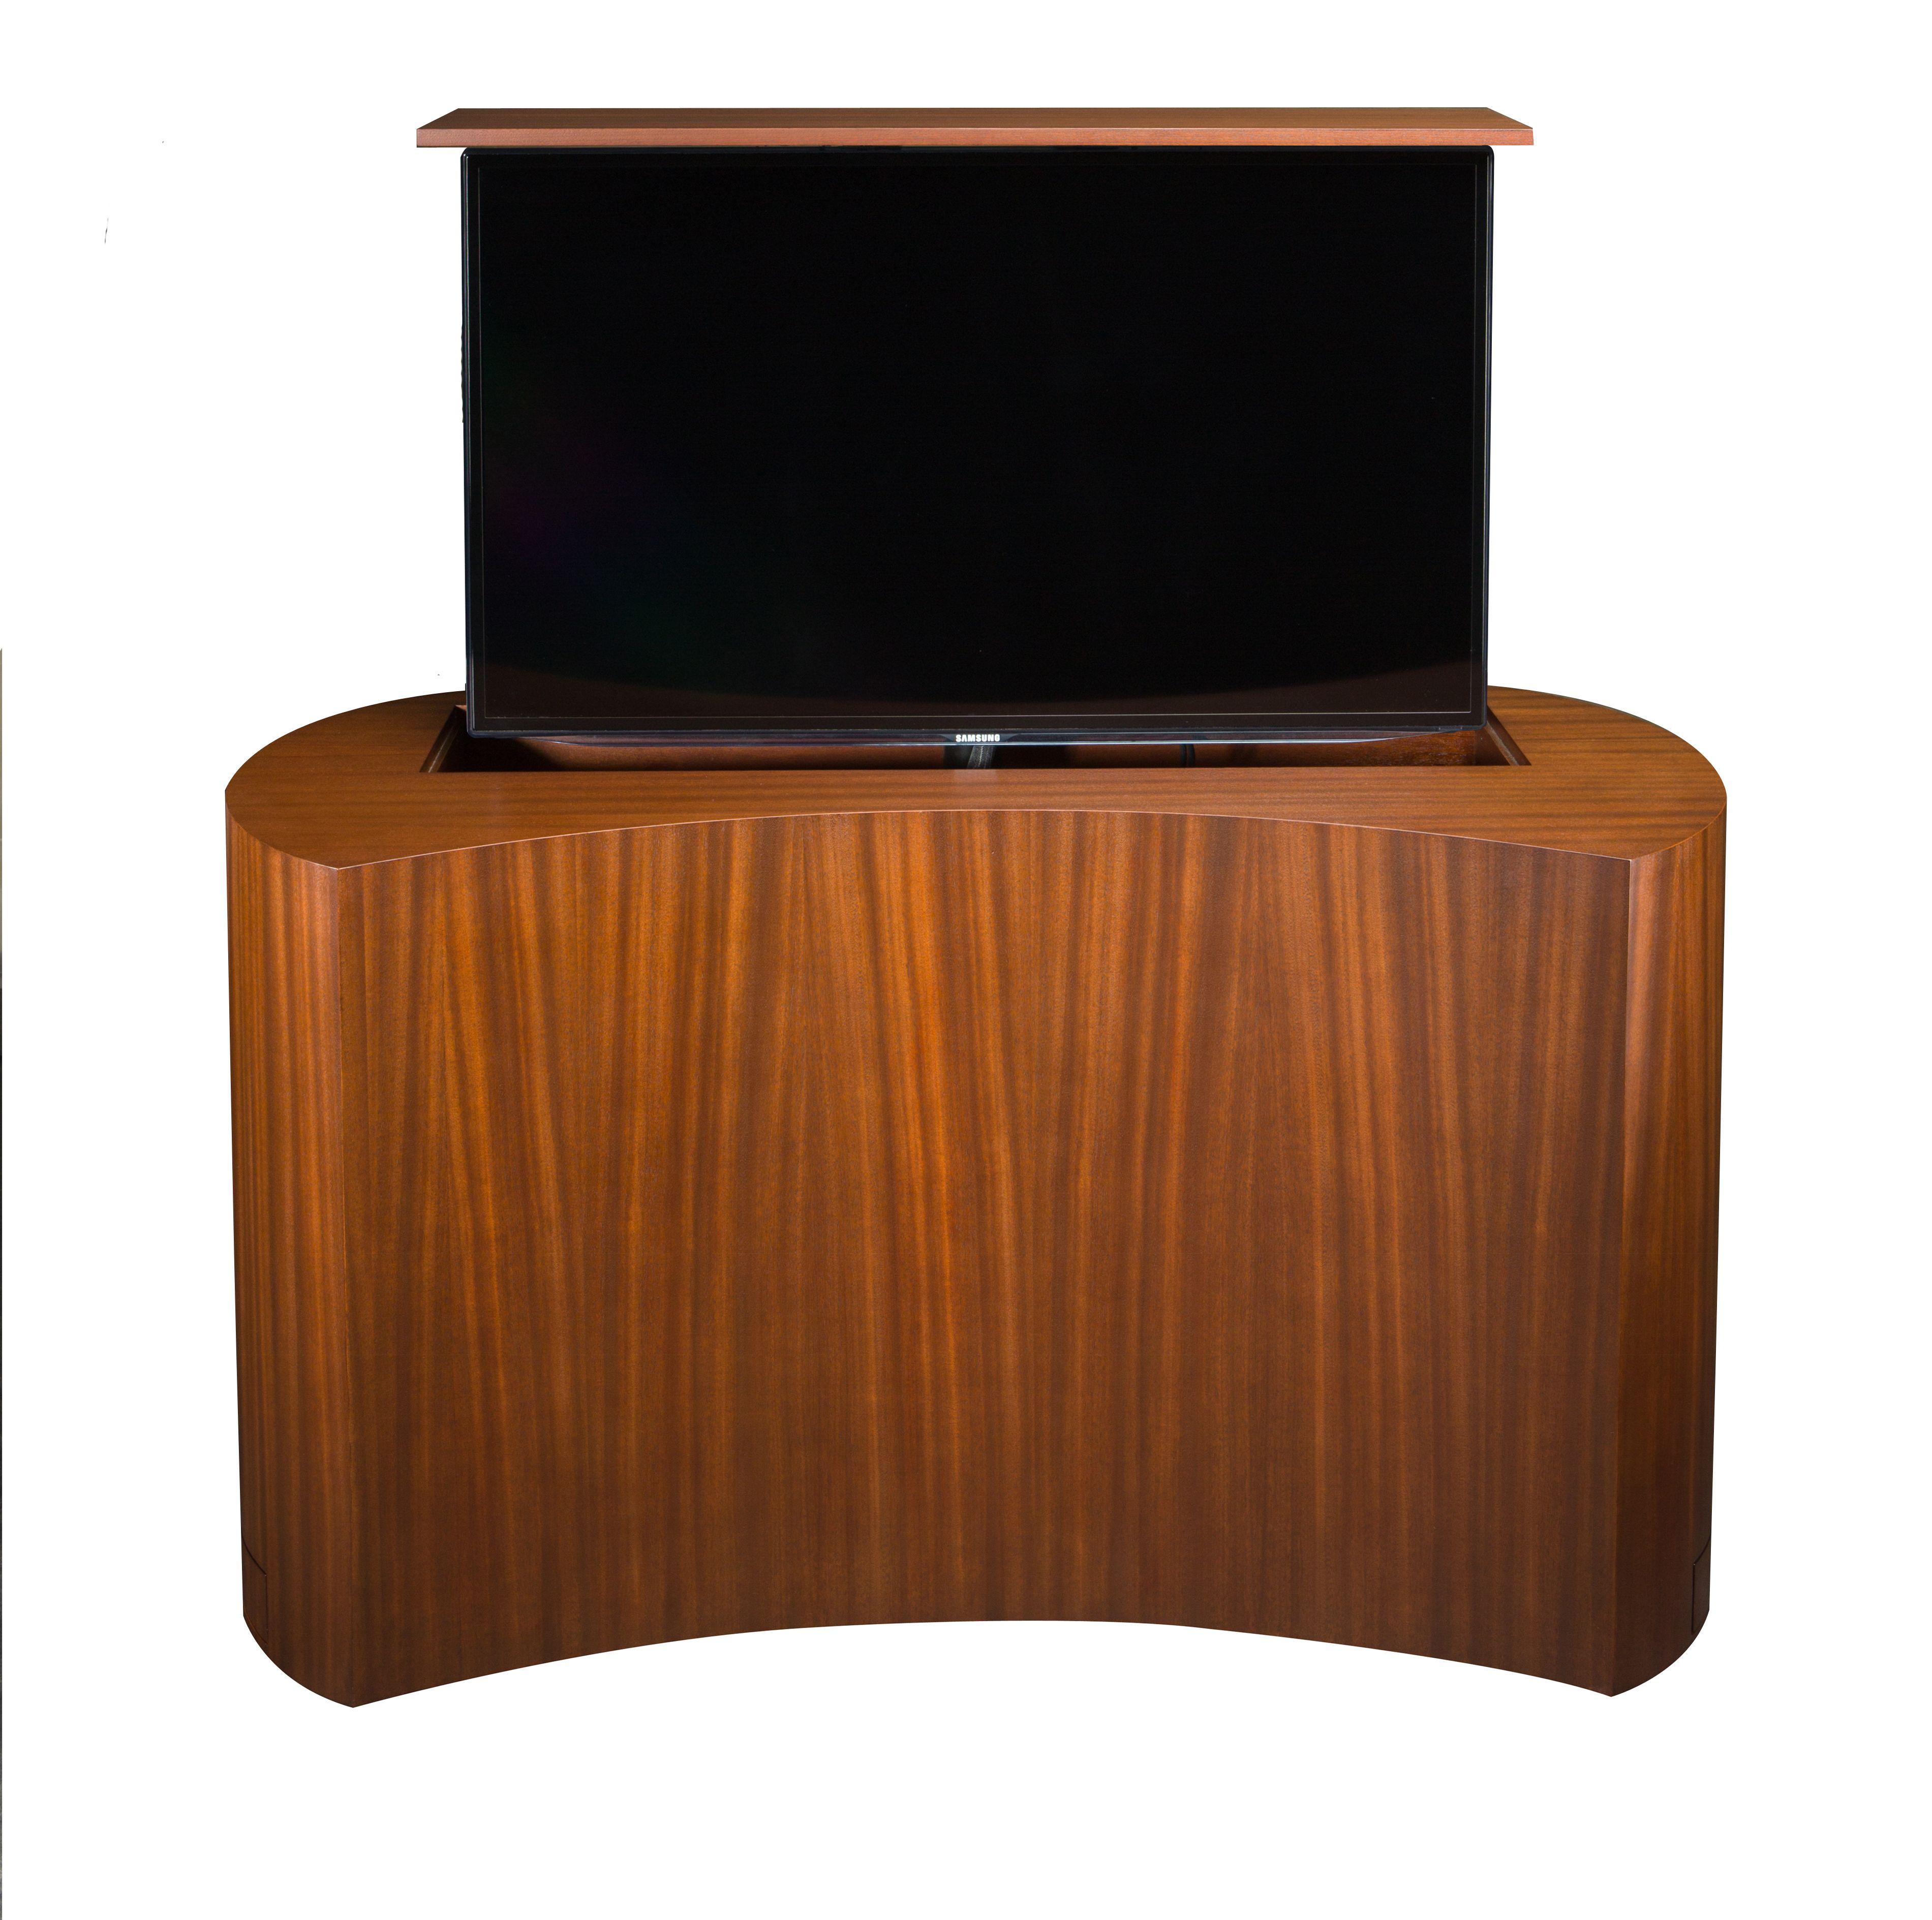 Coast motorized tv lift cabinet cabinets matttroy for Motorized tv lift cabinets